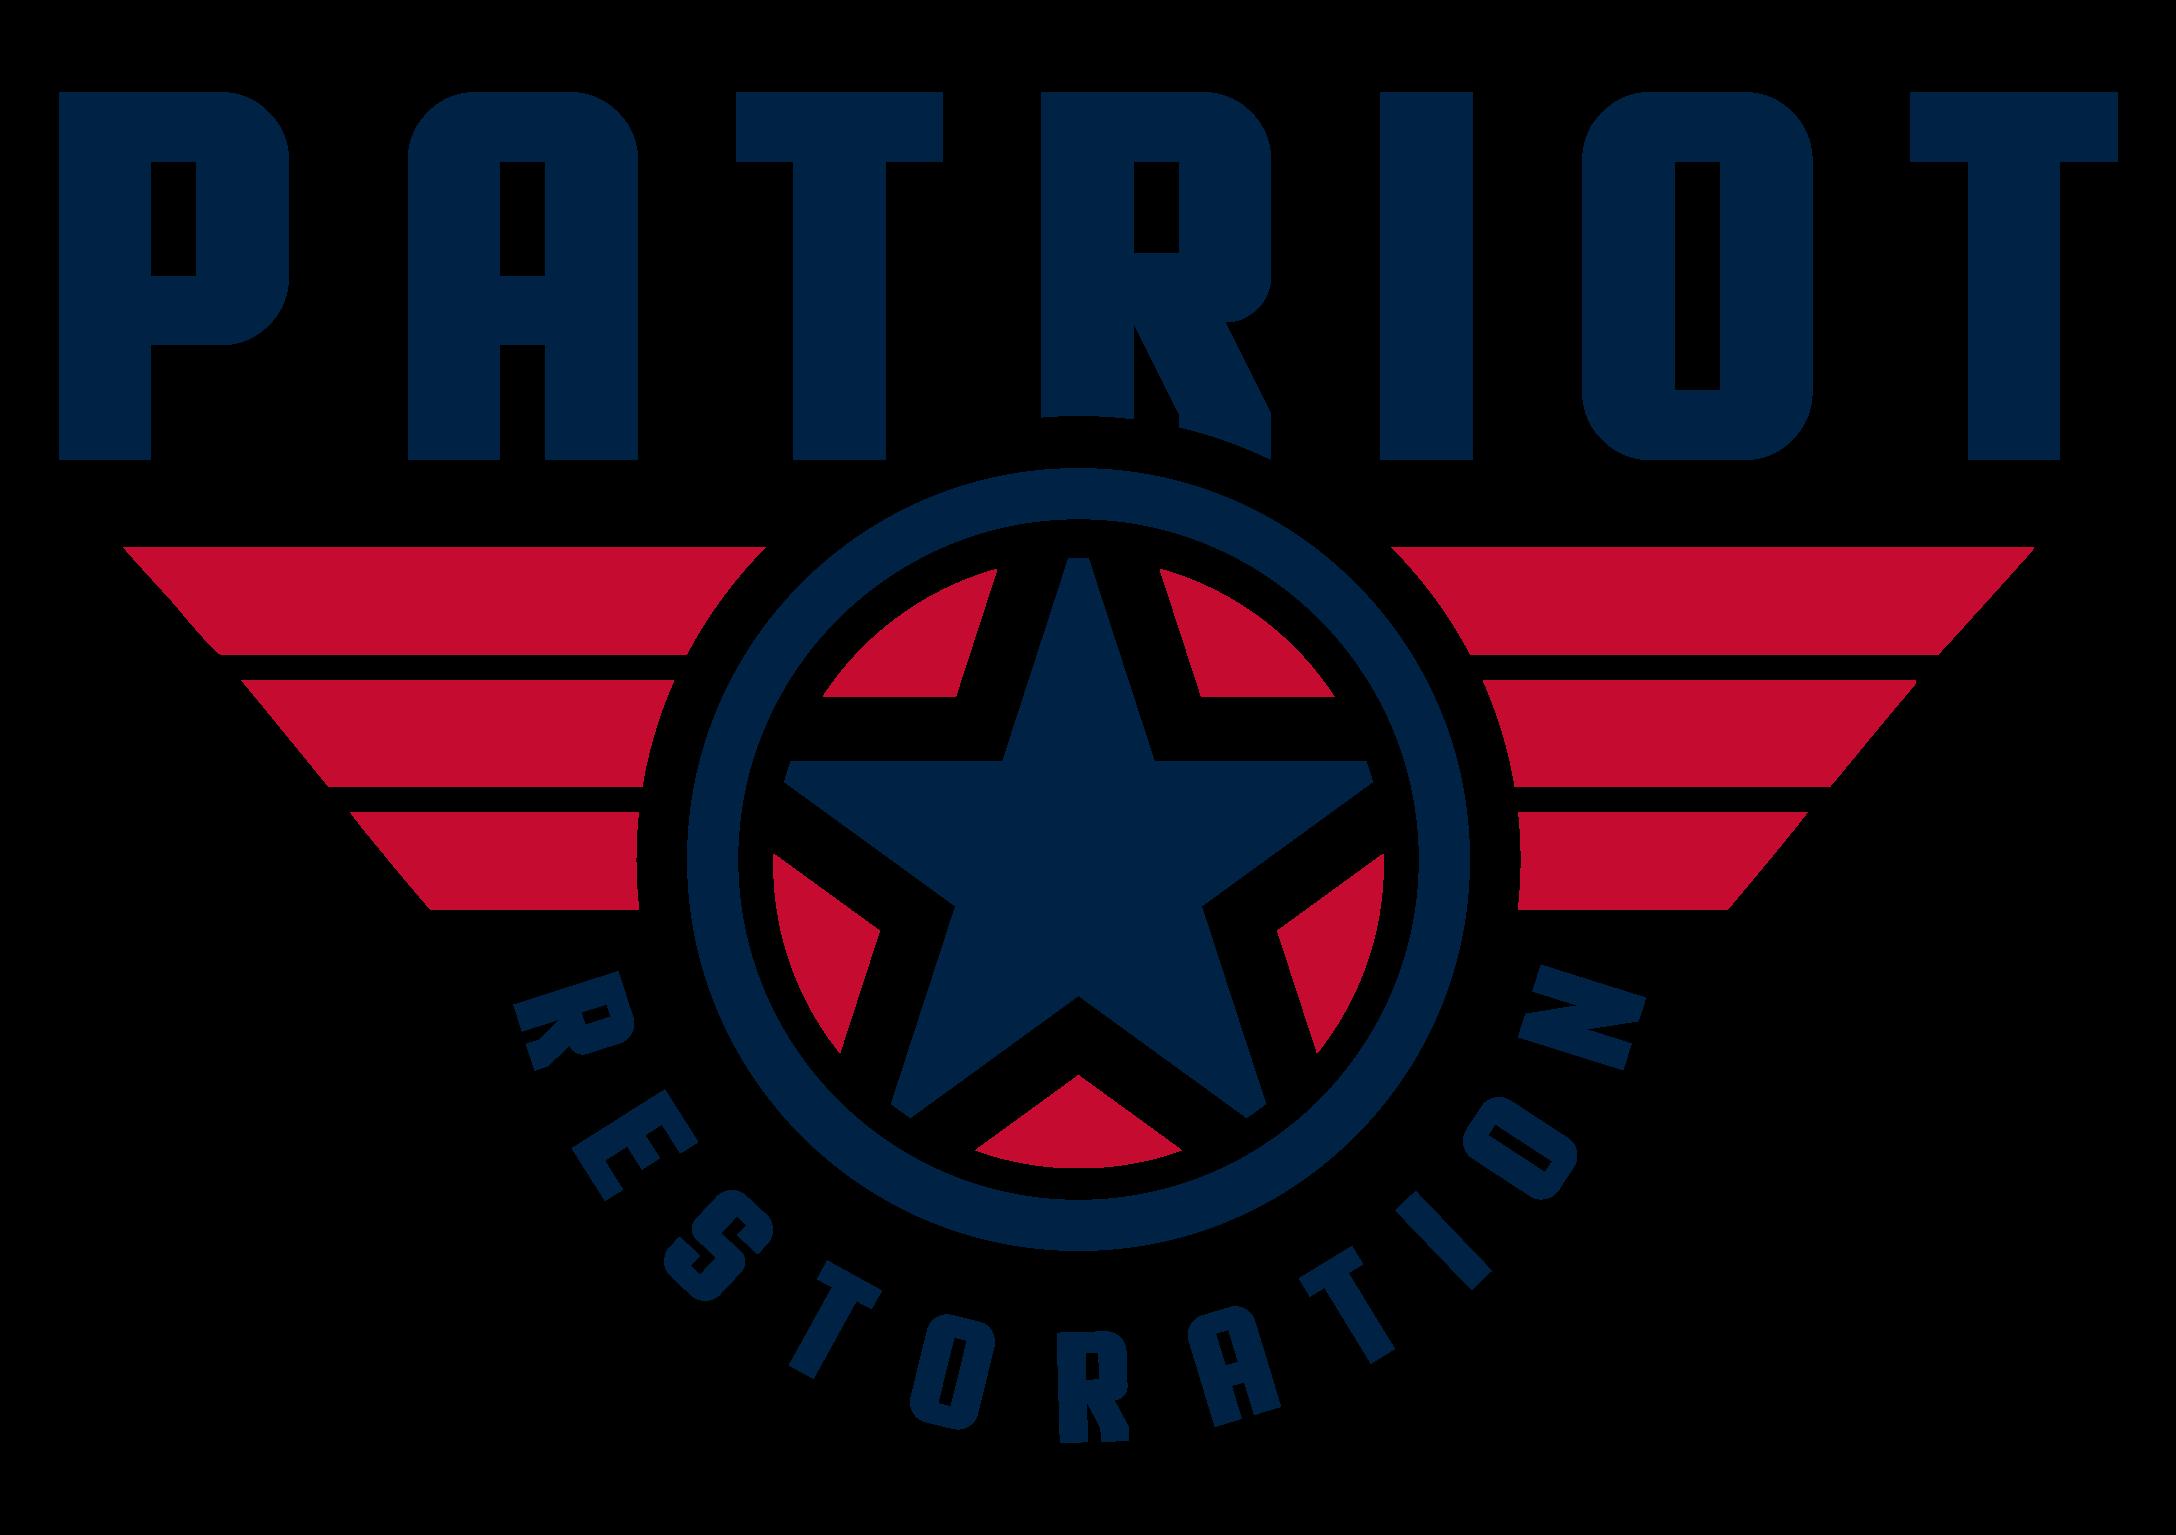 the patriot restoration logo, but very very big